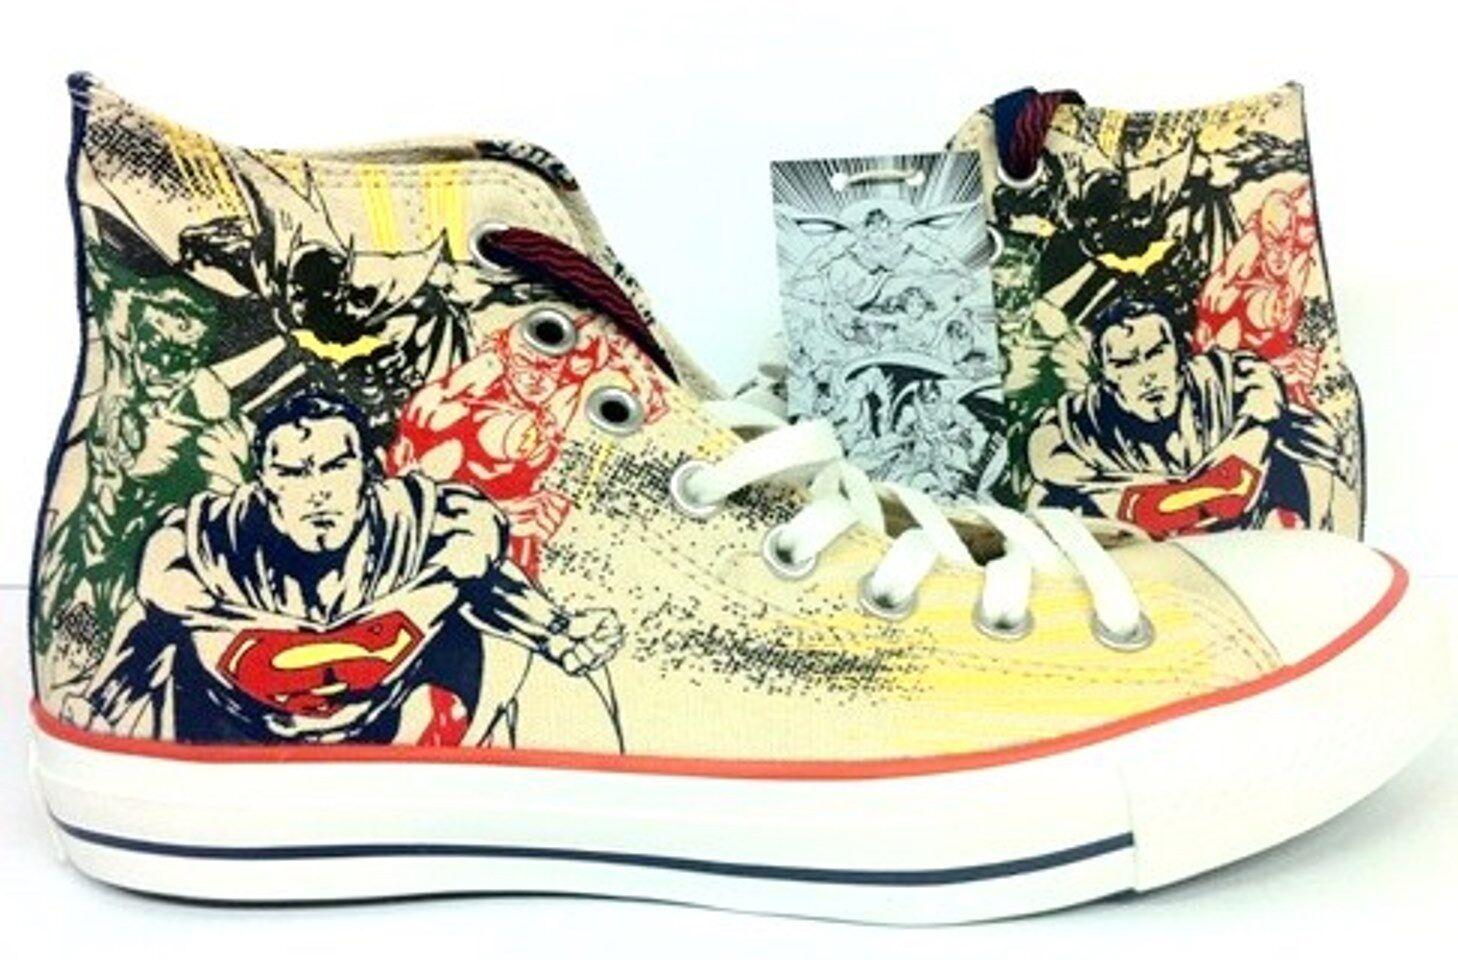 Nuova Conversazione All Star Chuck Taylor DC Comics Superman Batman Khaki scarpe 132440C